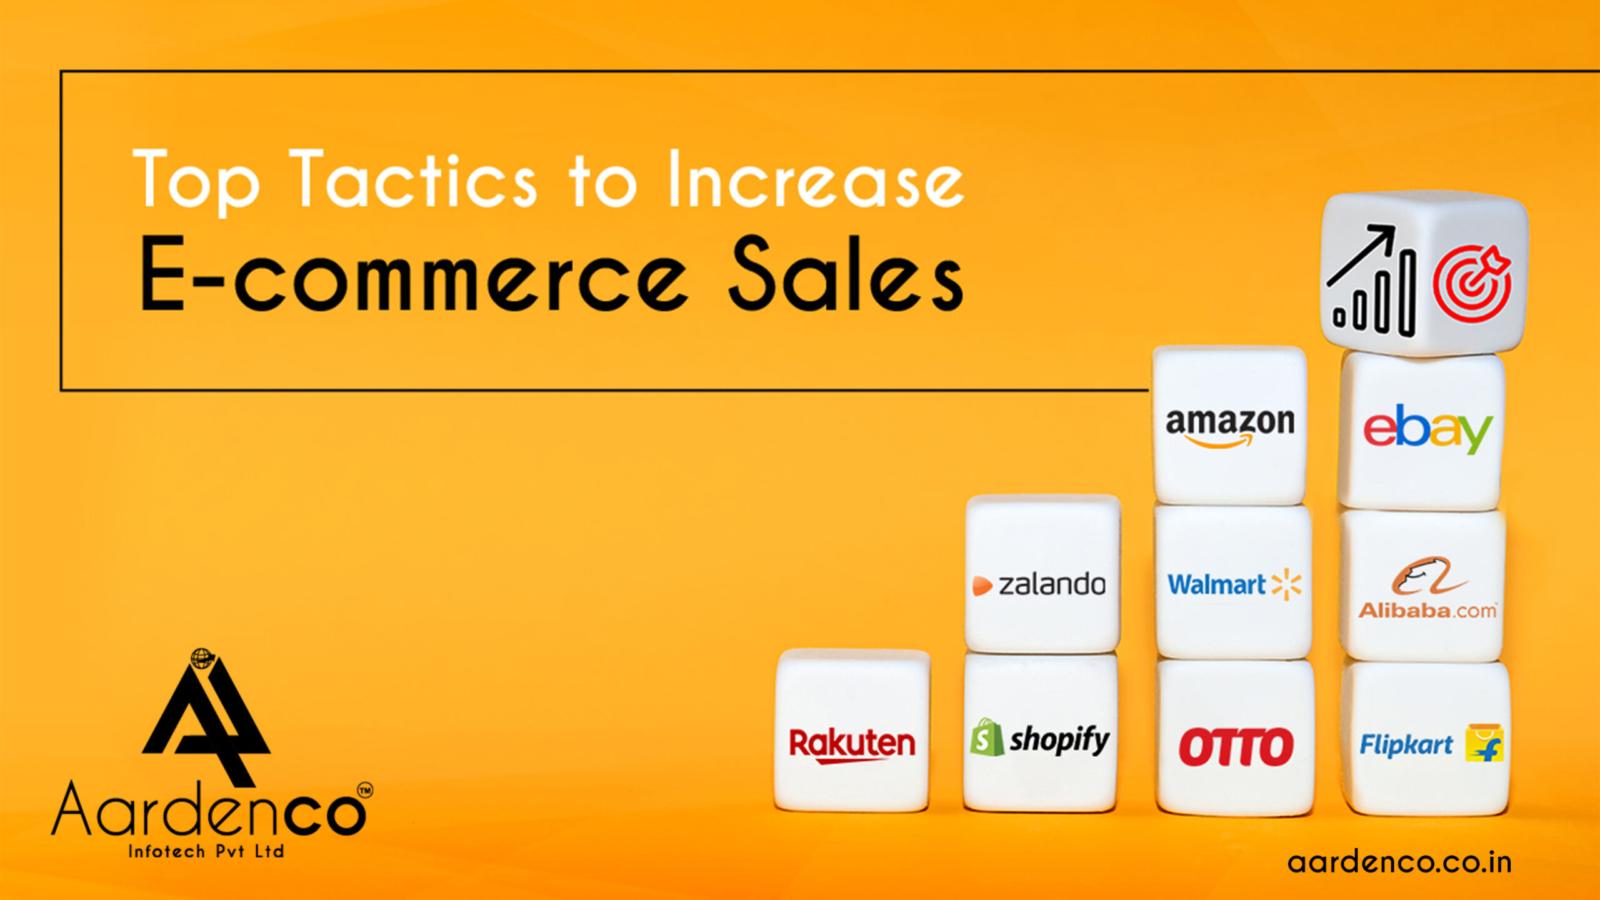 E-commerce-Sales-Increase-Aardenco